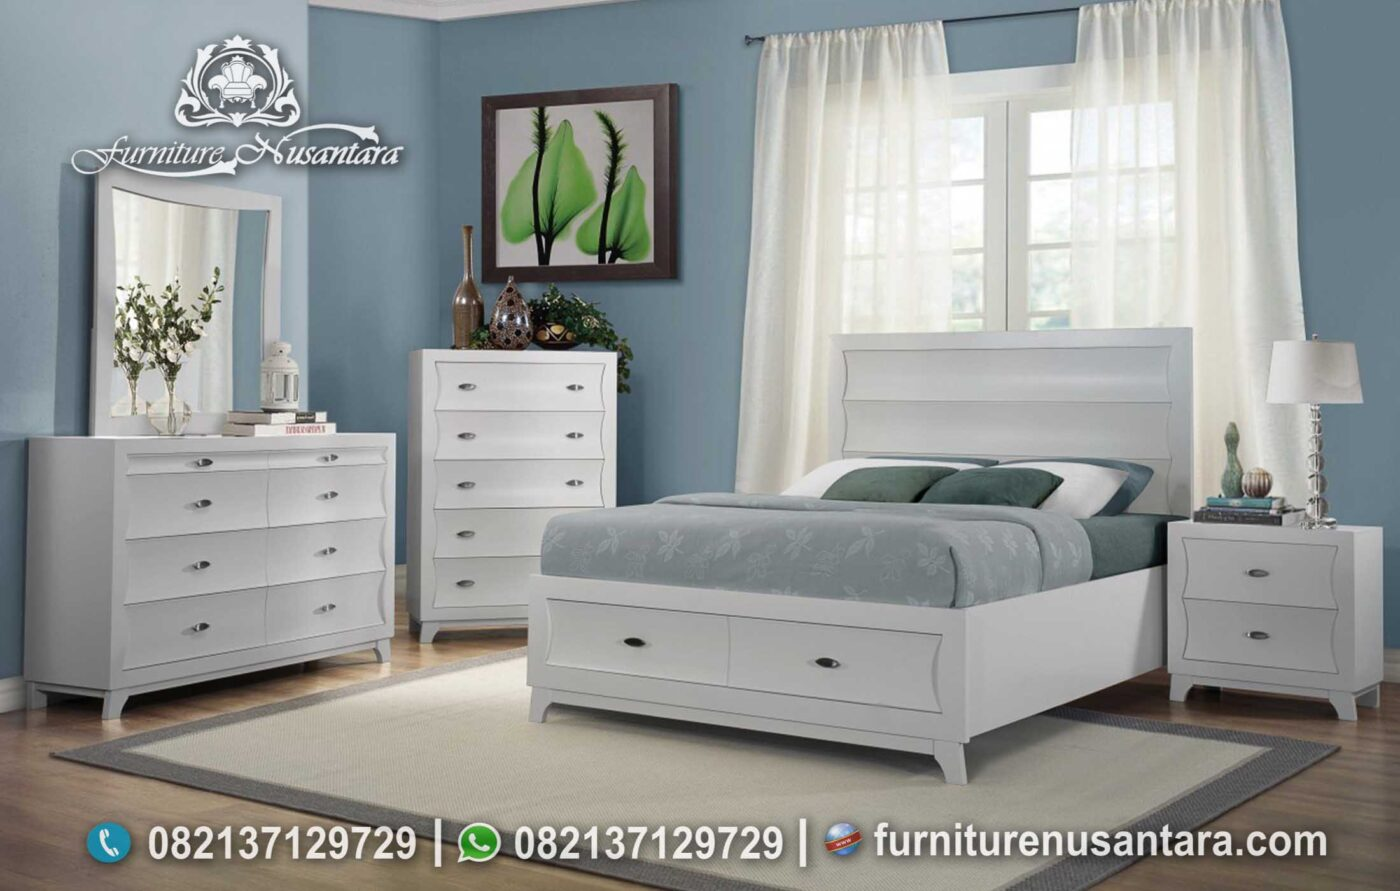 Desain Kamar Minimalis Modern Putih KS-210, Furniture Nusantara